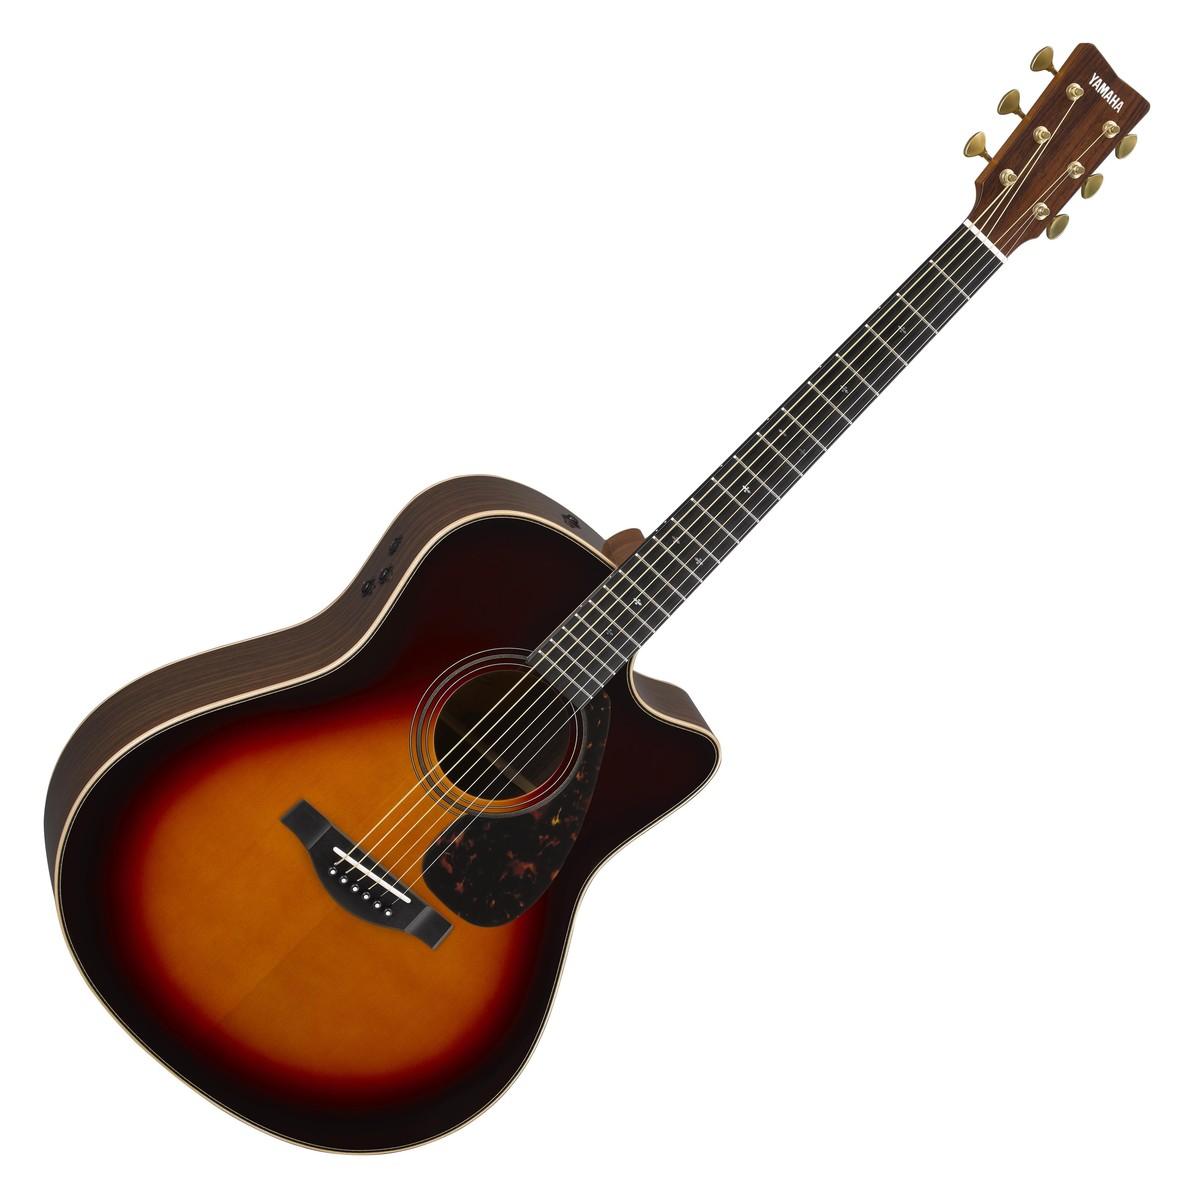 Yamaha gllx26careiitbs electro acoustic guitar tobacco for Acoustic yamaha guitar